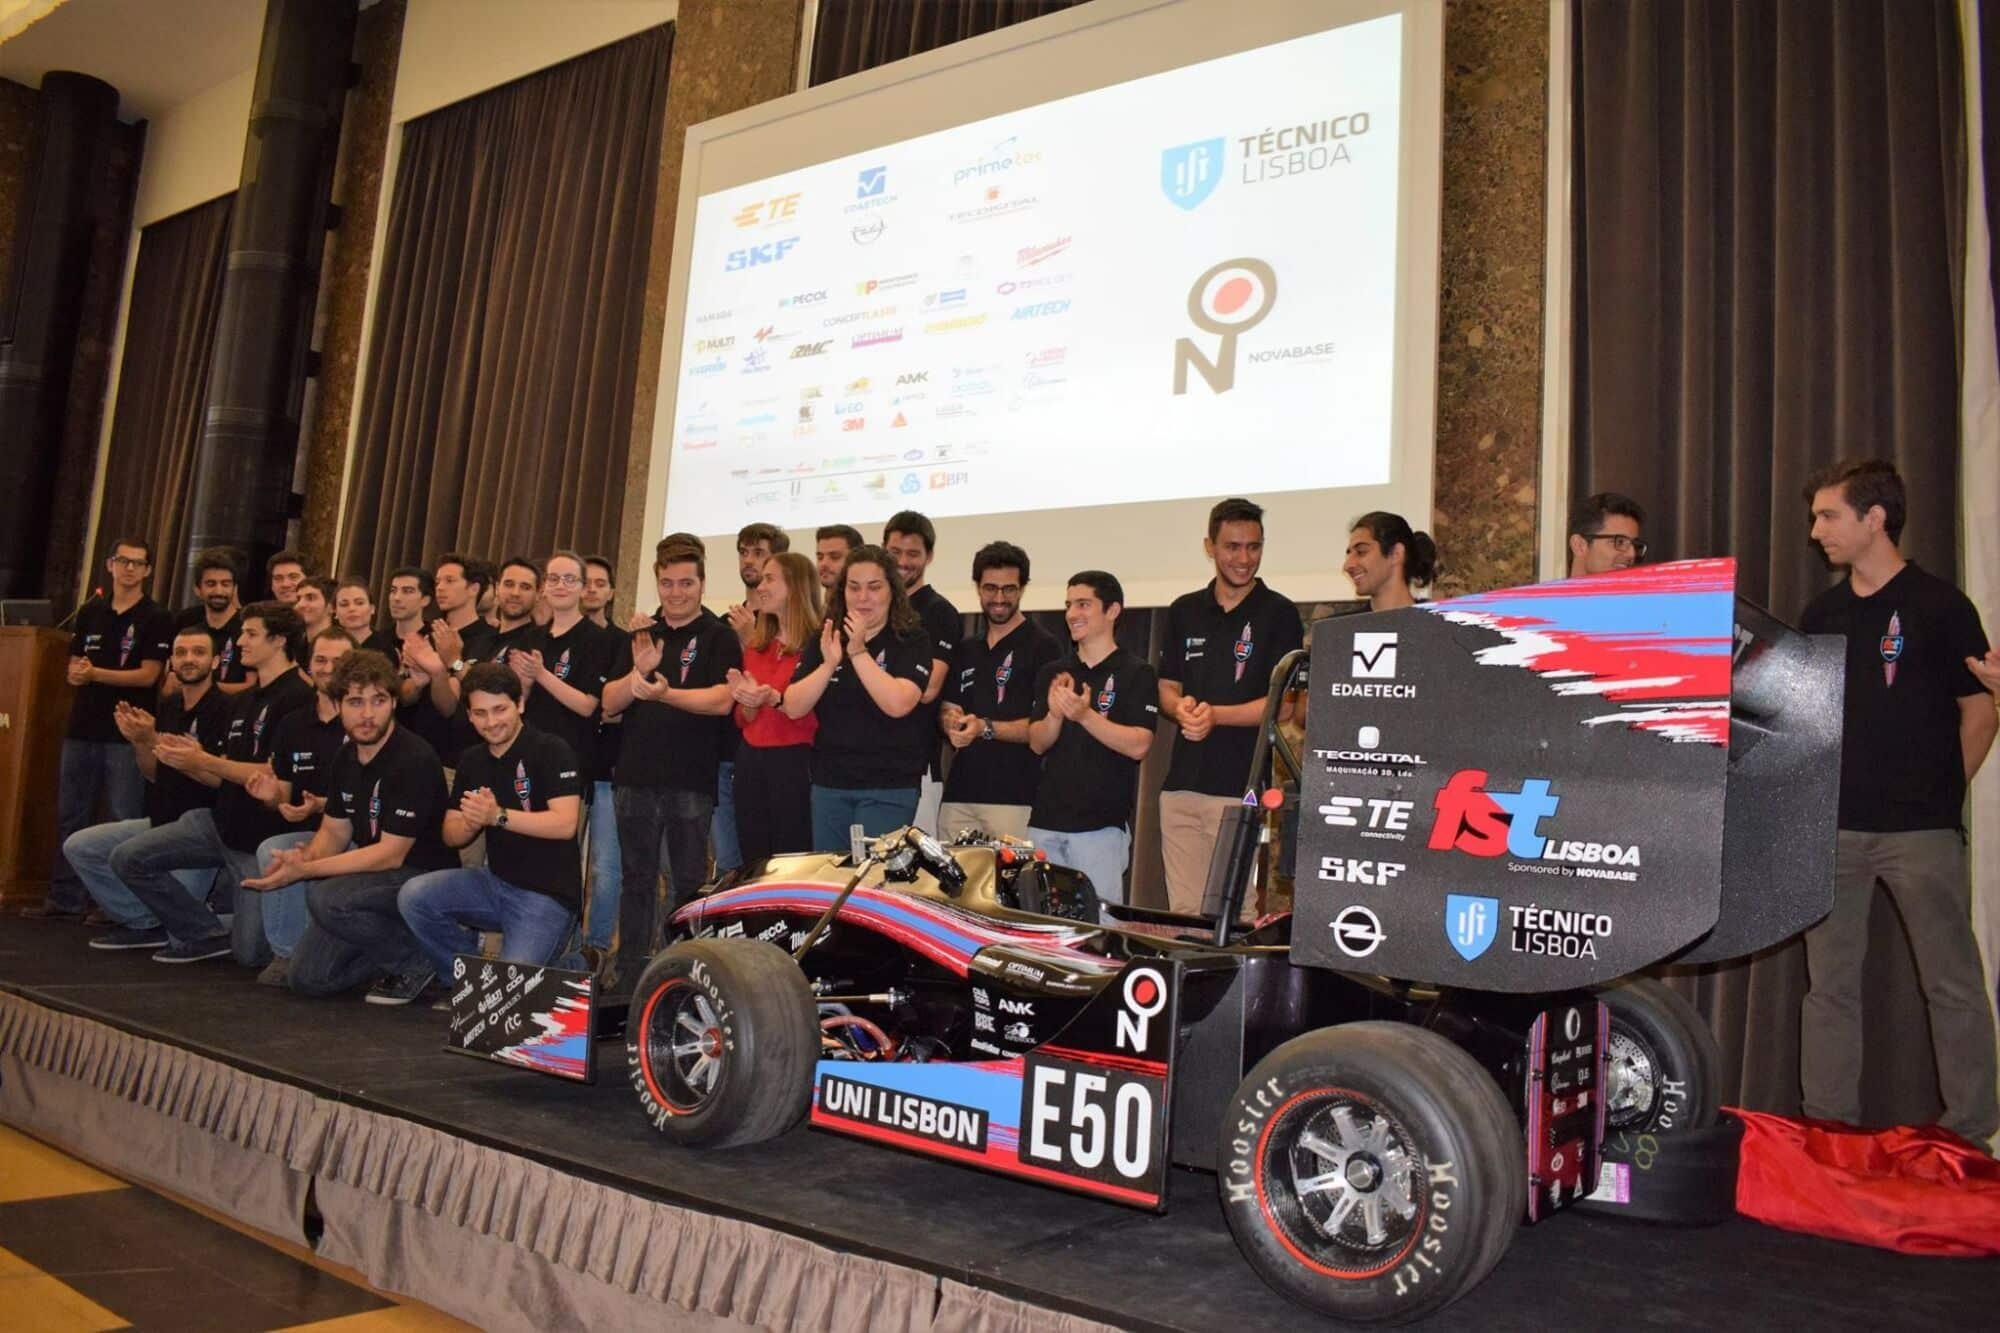 Criatopo Publicidade Patrocina Formula Student do Técnico: o FST 07e.